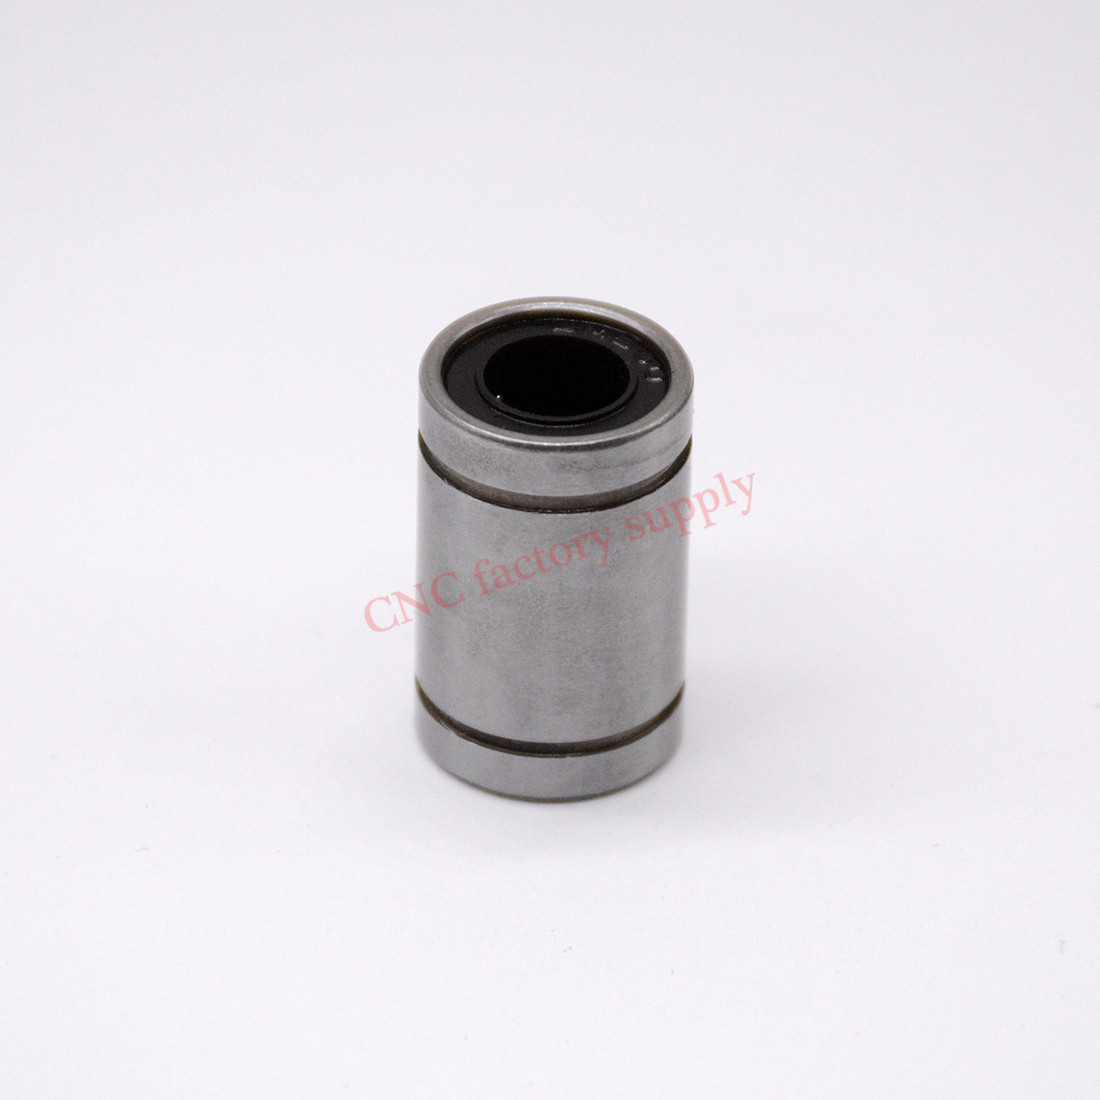 Hot sale  1pc LM20UU Linear Bushing  20mm CNC Linear Bearings hot sale 1pc lm12uu linear bushing 12mm cnc linear bearings